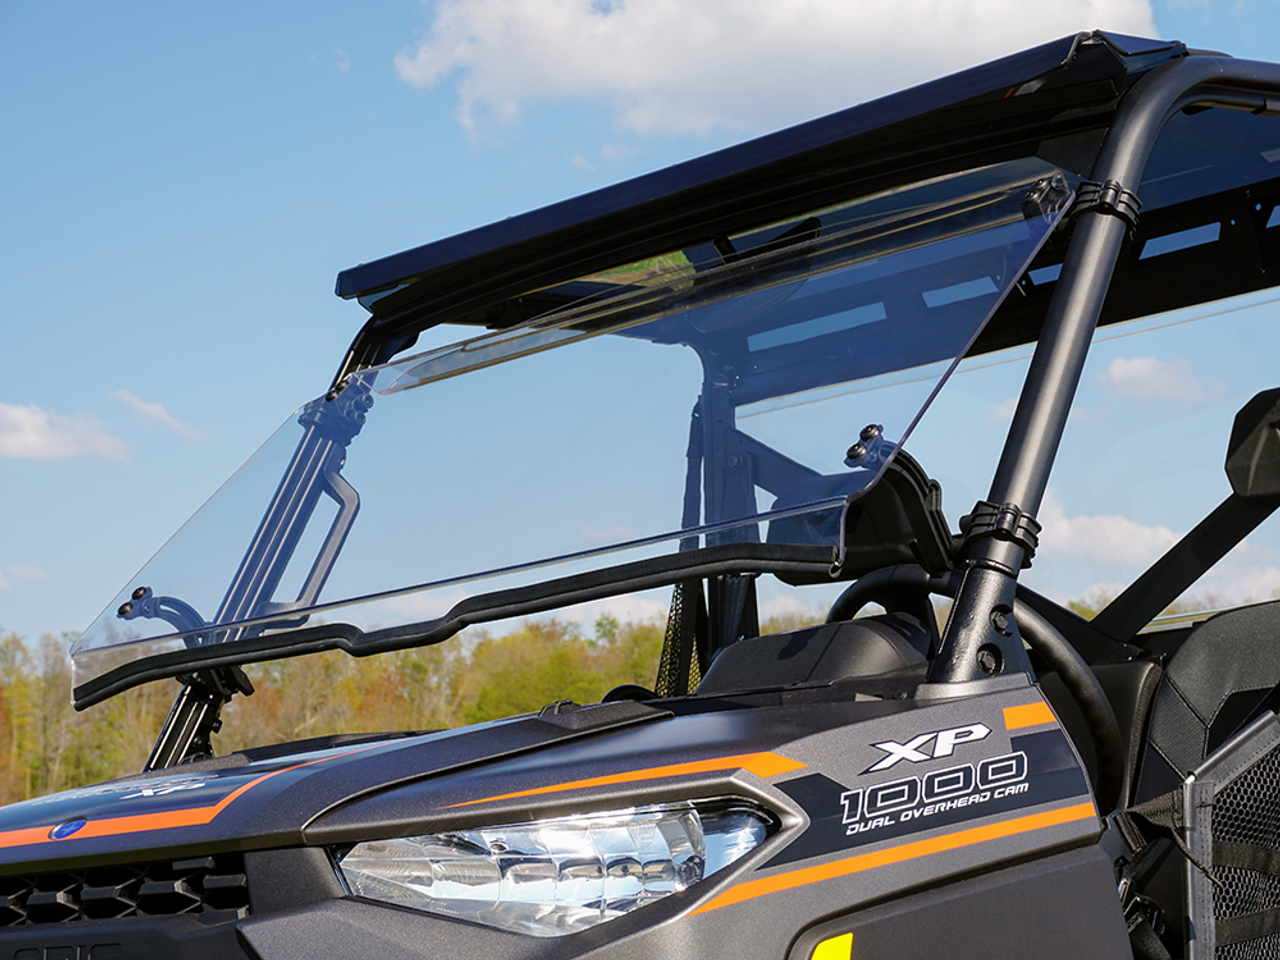 Polaris Ranger Windshield >> Polaris Ranger Pro Fit Xp 1000 Tilting Scratch Resistant Windshield 2018